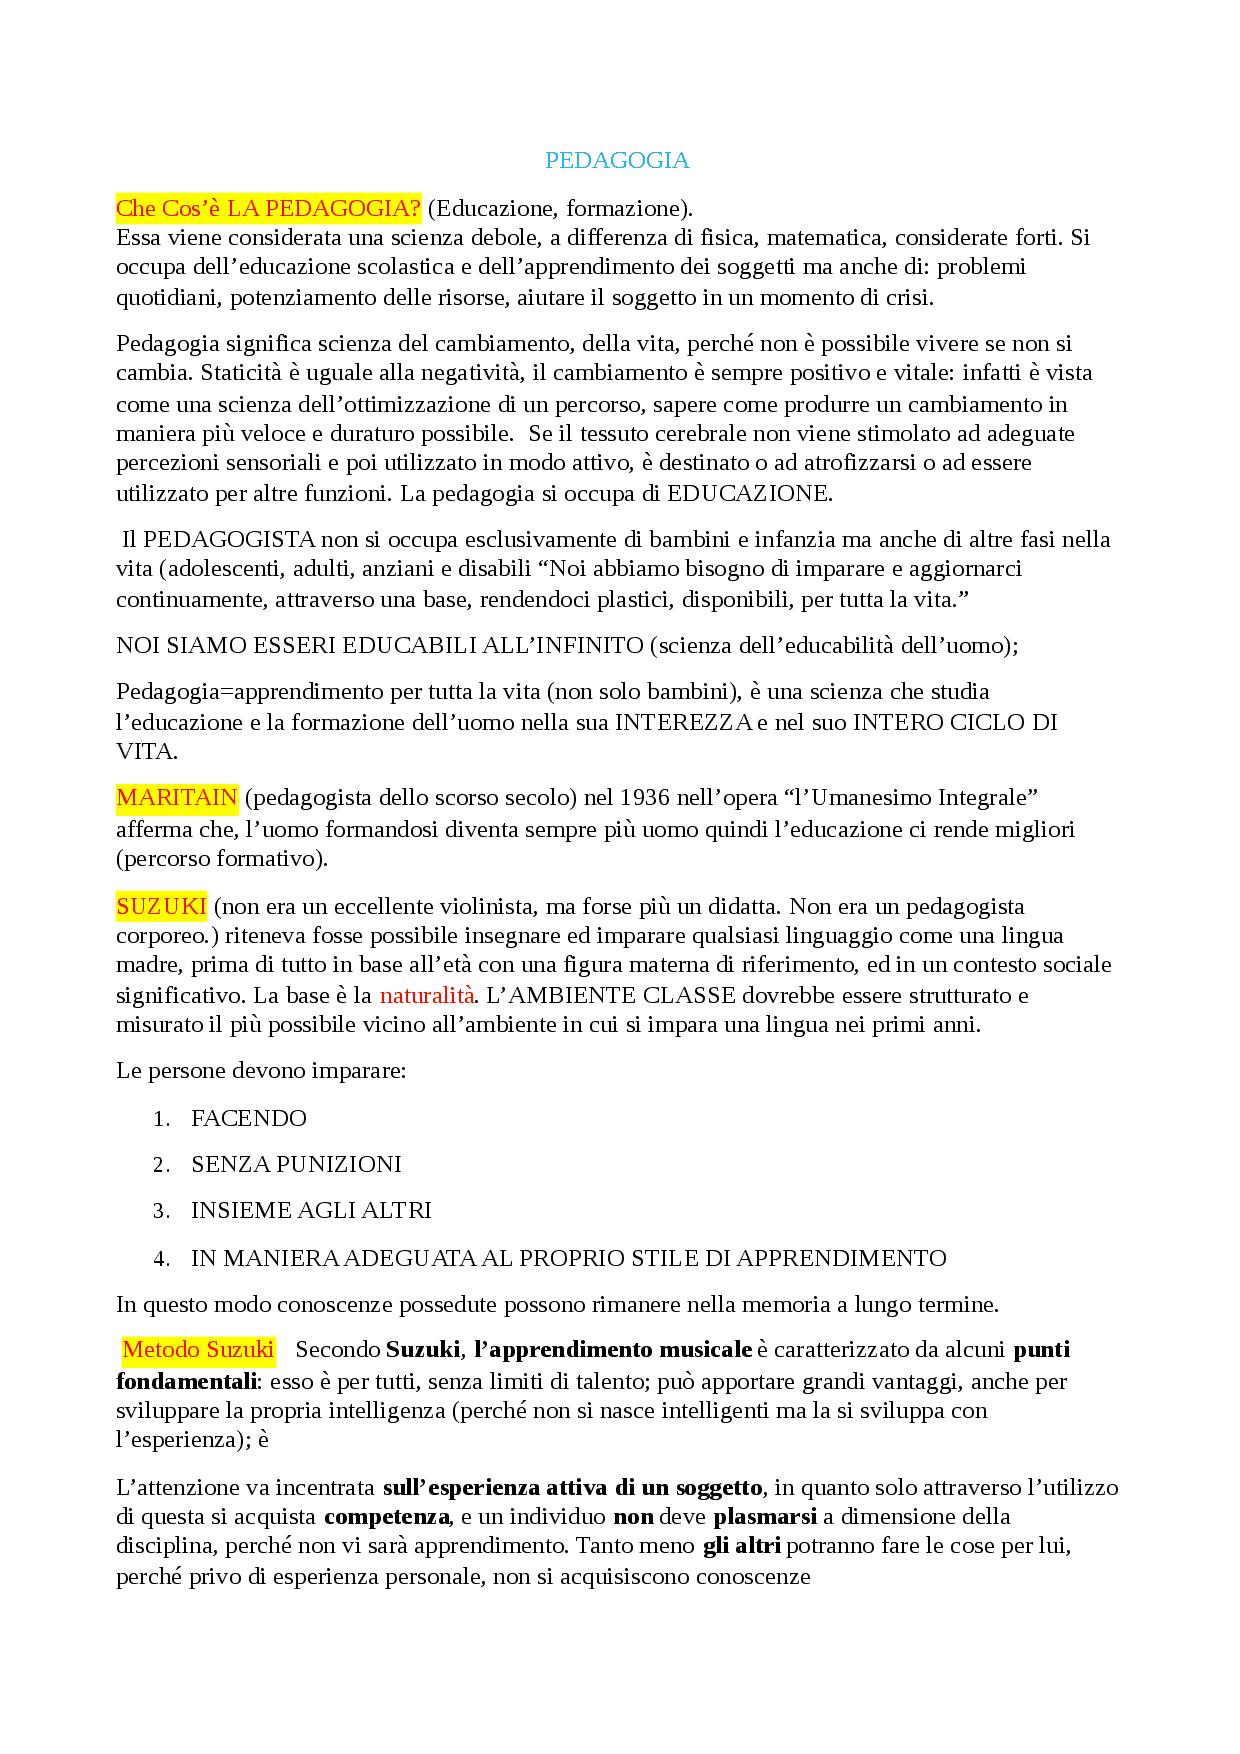 Riassunto Del Libro Di Pedagogia - Docsity dedans Docsity